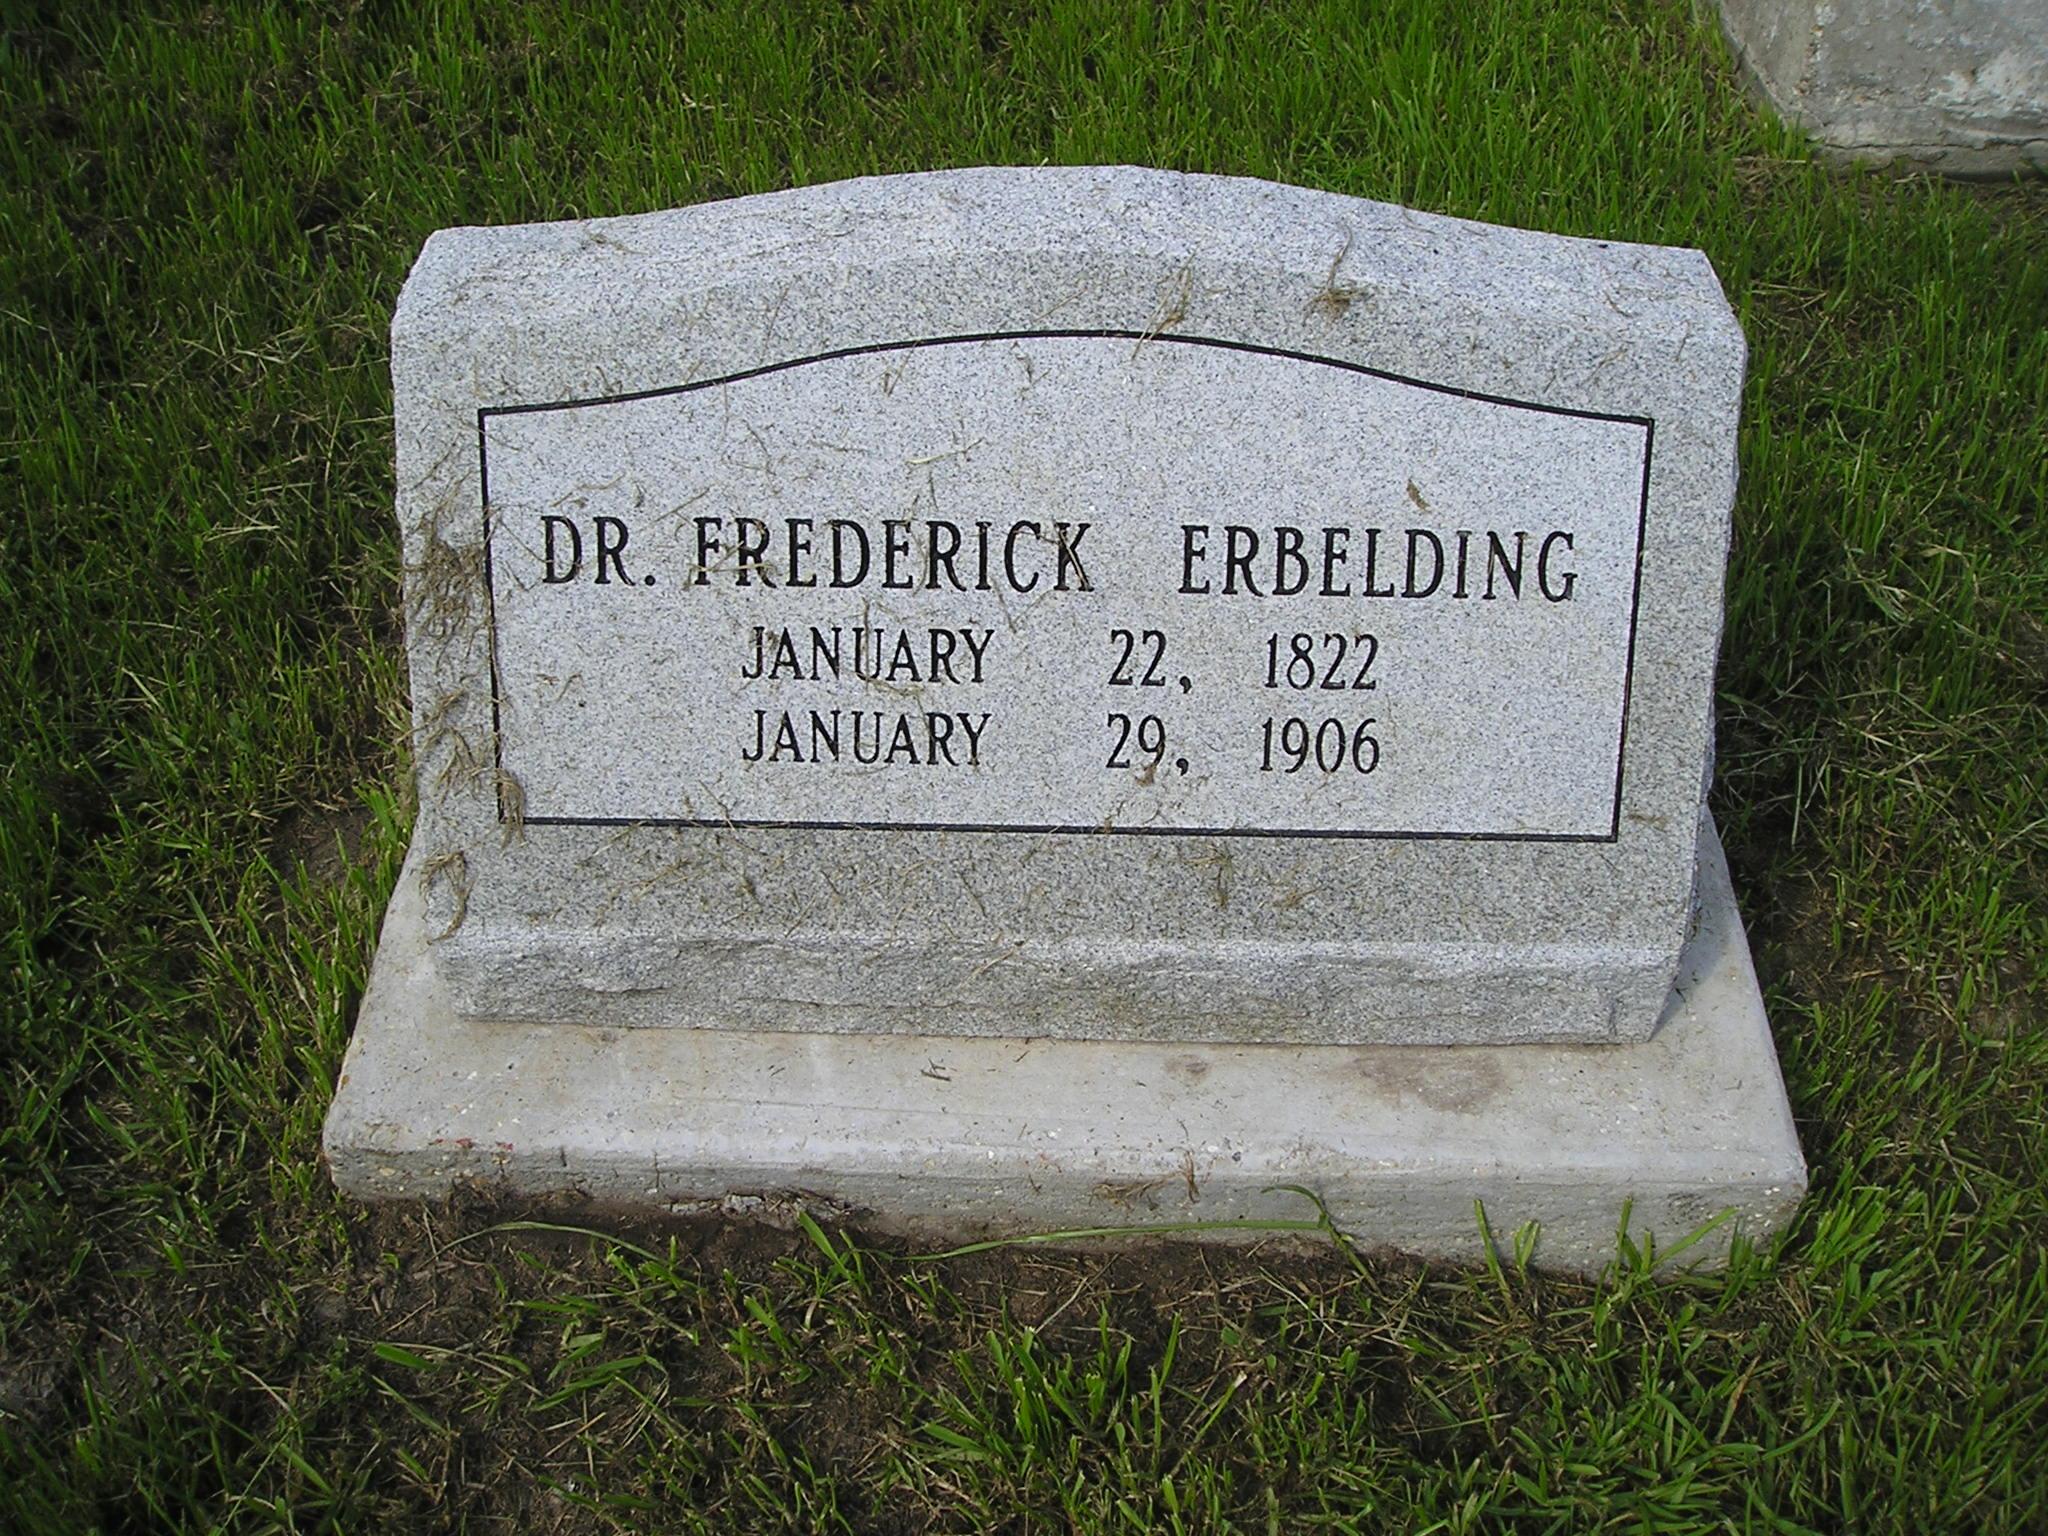 Dr Frederick Erbelding